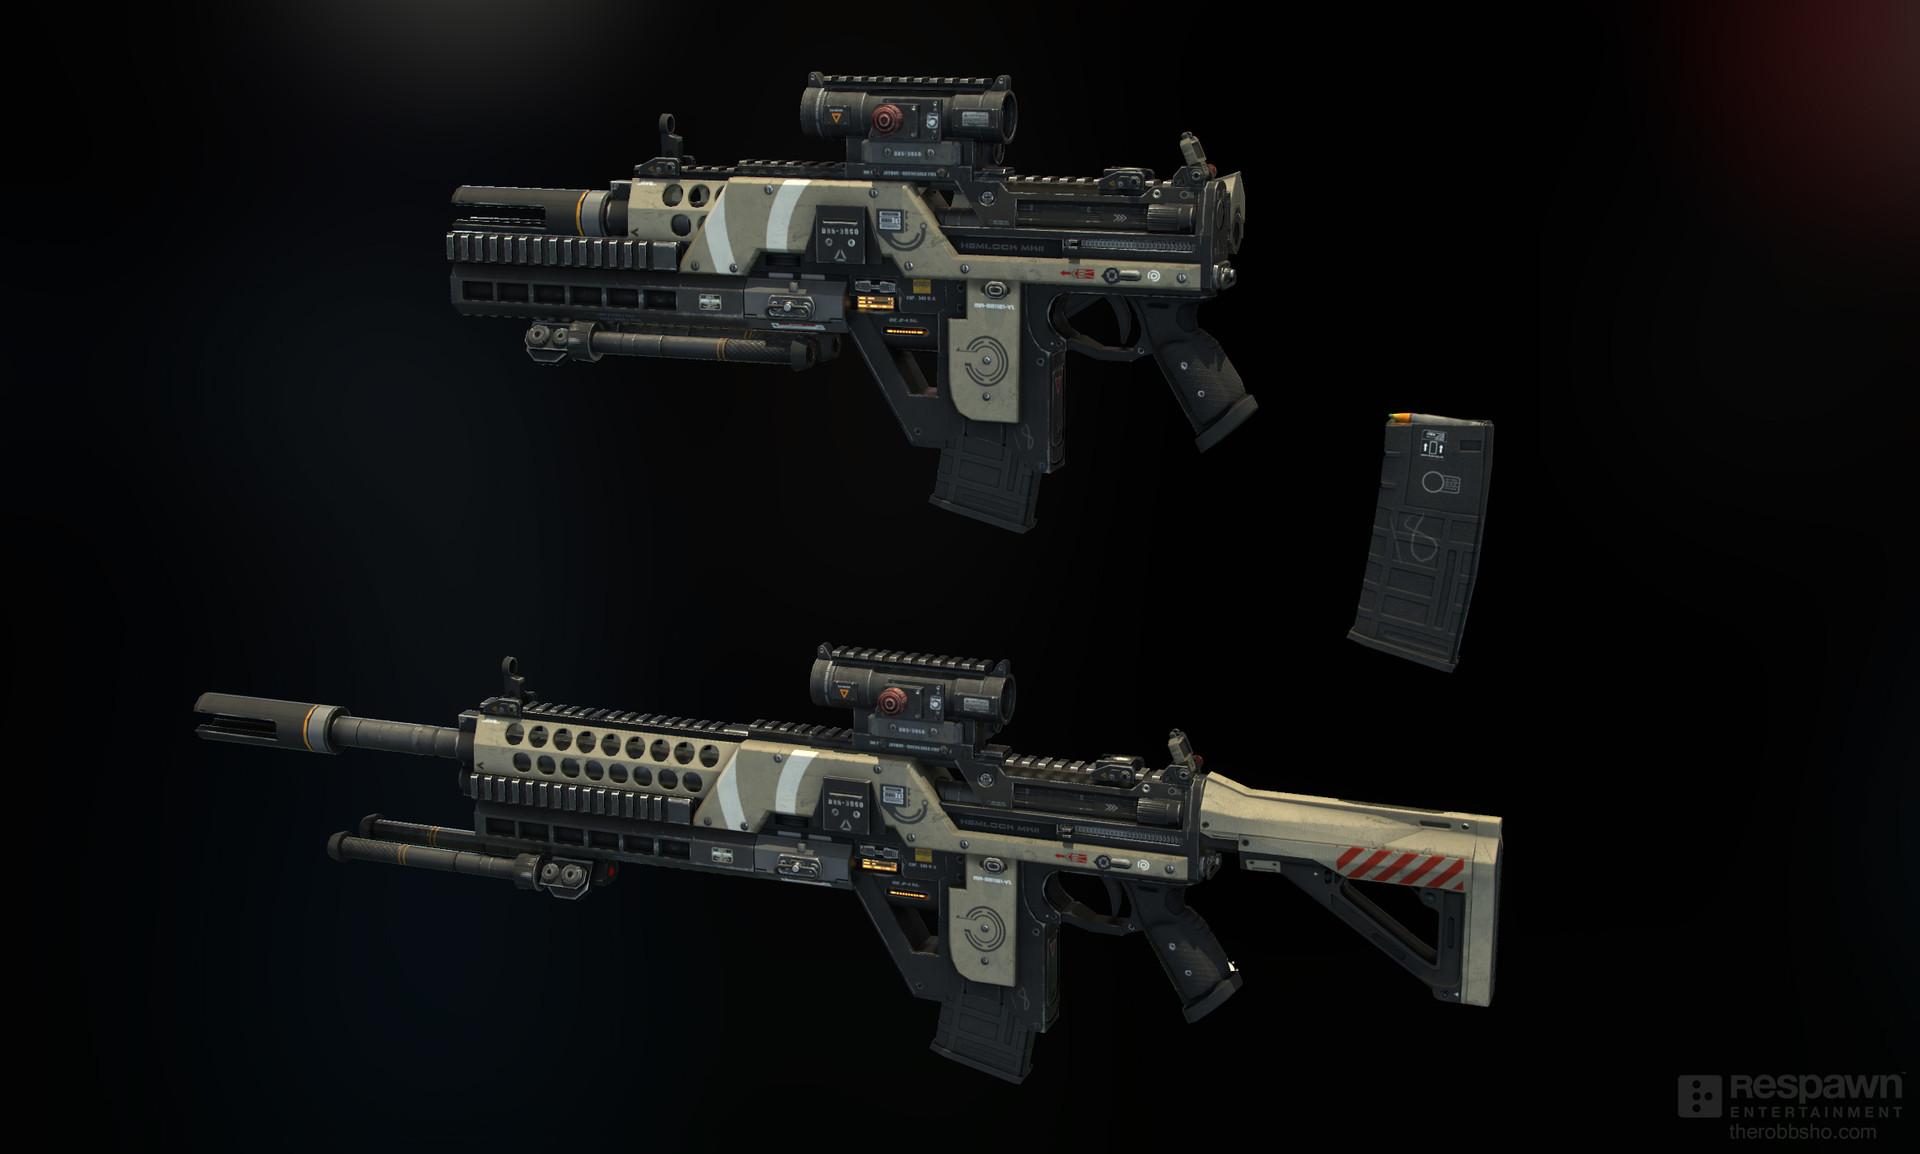 titanfall weapons minecraft mod - HD1920×1154